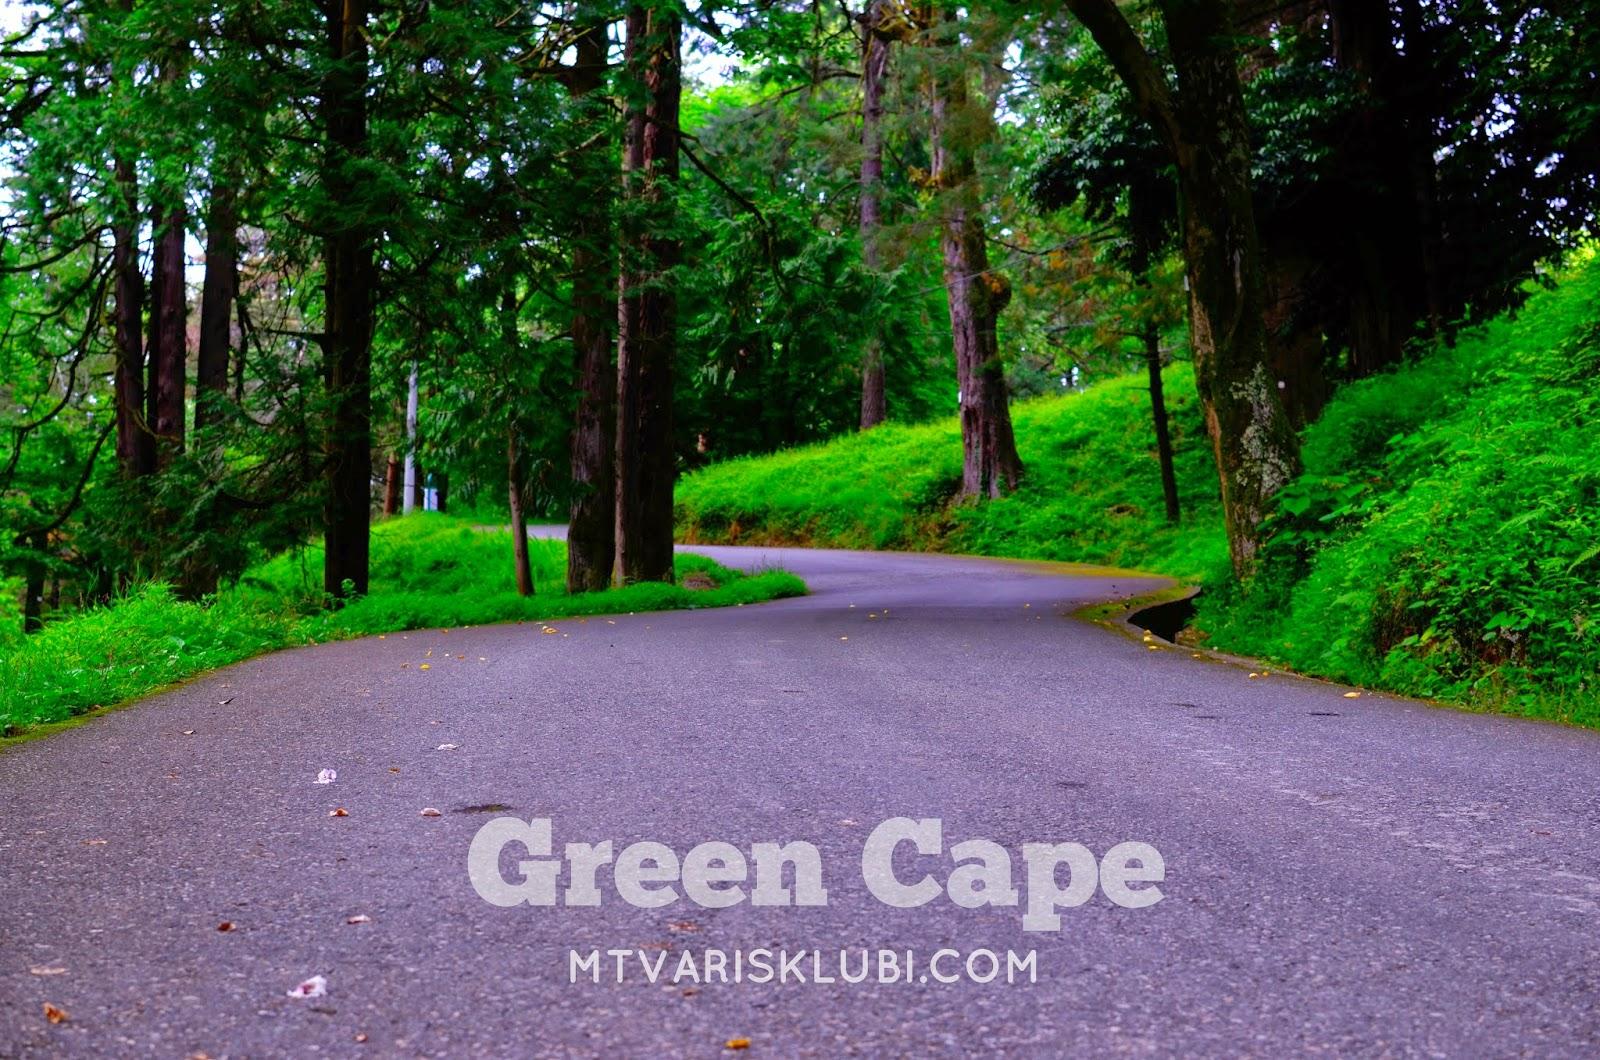 Green cape მწვანე კონცხი